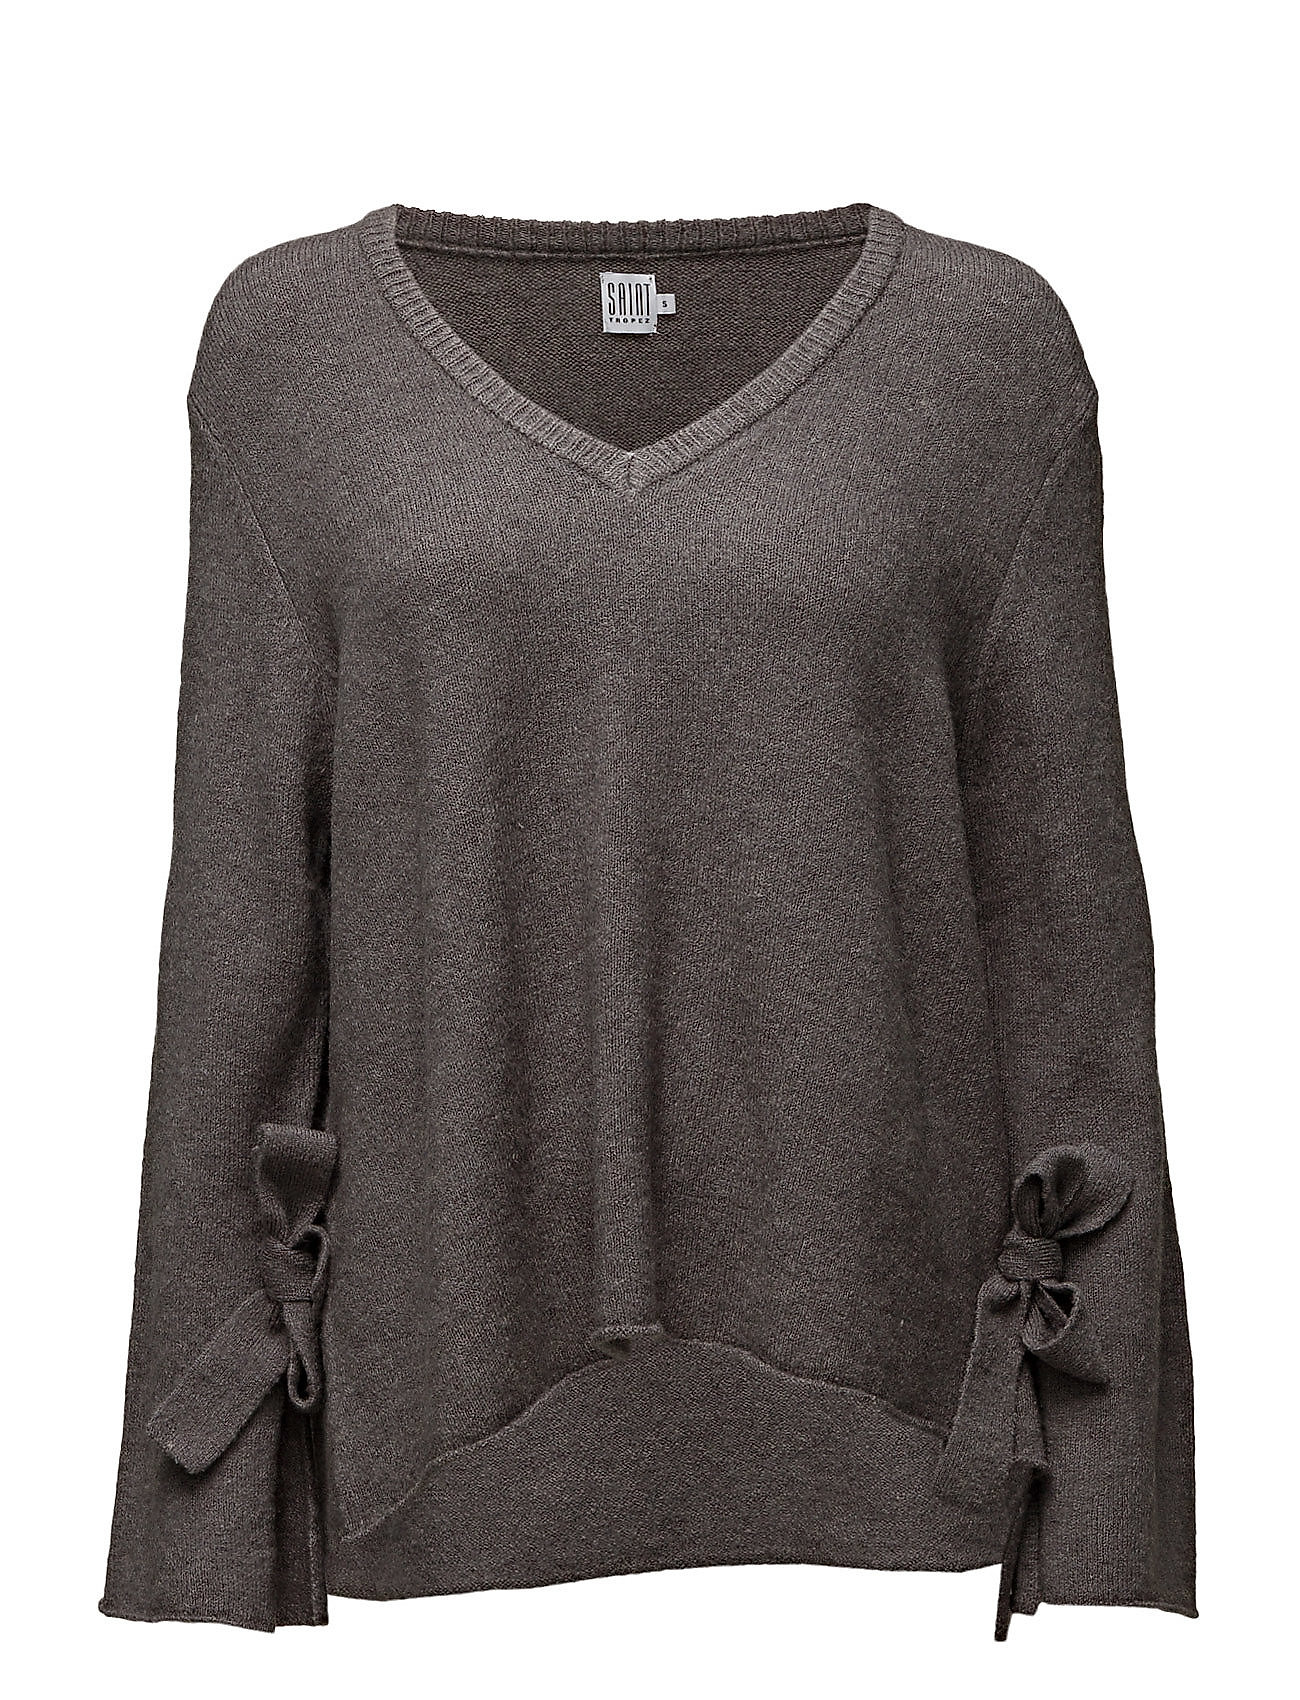 Knit Blouse With Tie Sleeve Saint Tropez Sweatshirts til Damer i